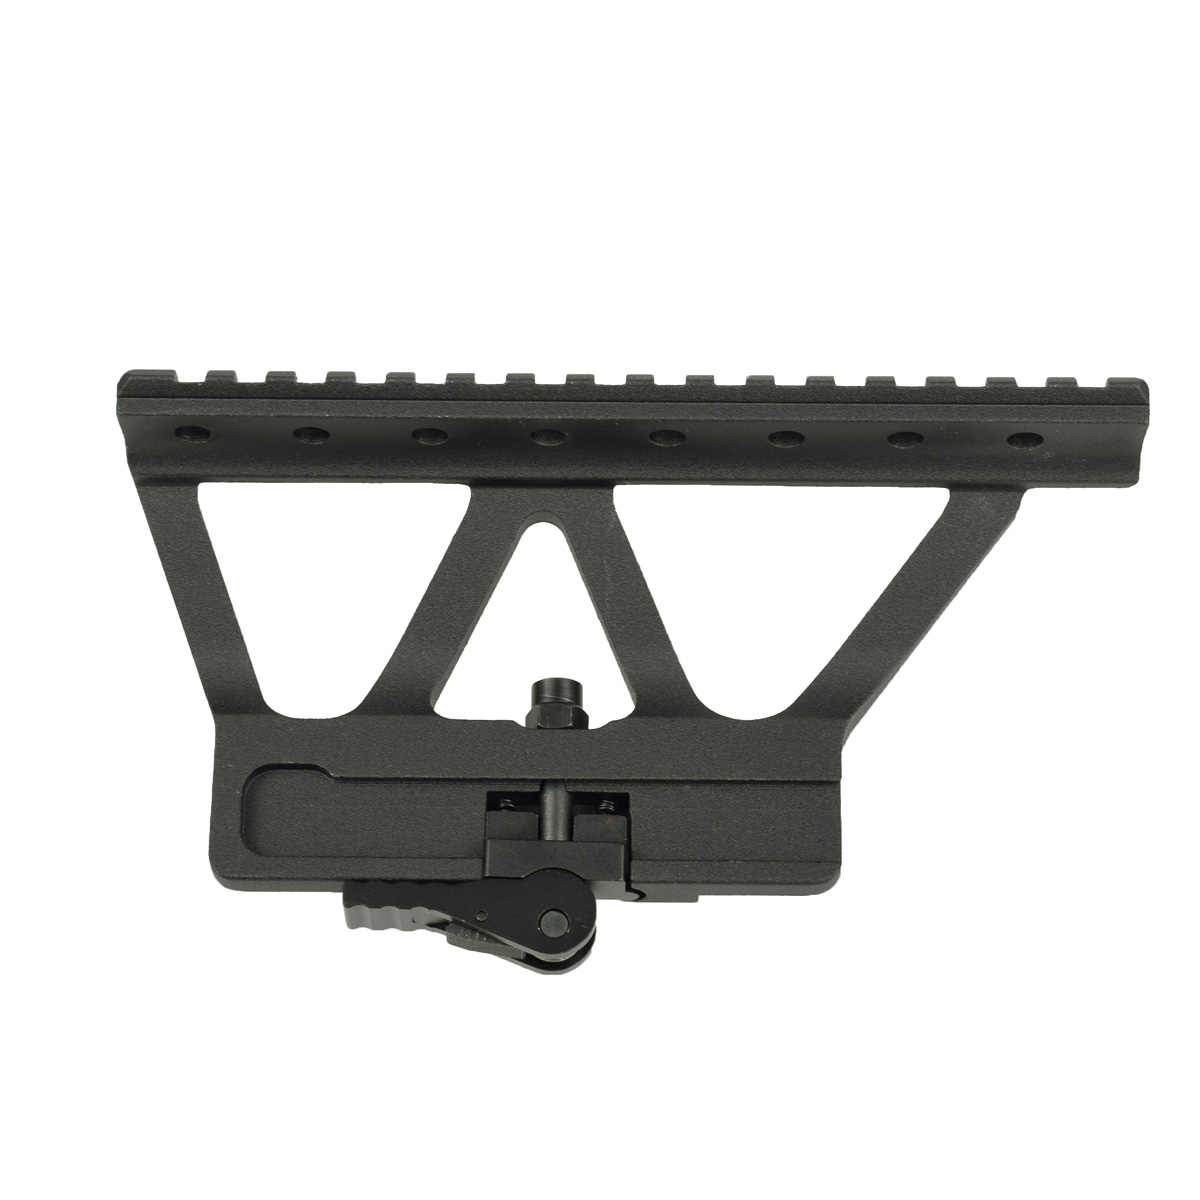 LAMBUL QD מהיר ניתוק AK אקדח רכבת היקף הר בסיס Picatinny רכבת צד הר עבור WASR C39v2 PSA VEPR Saiga